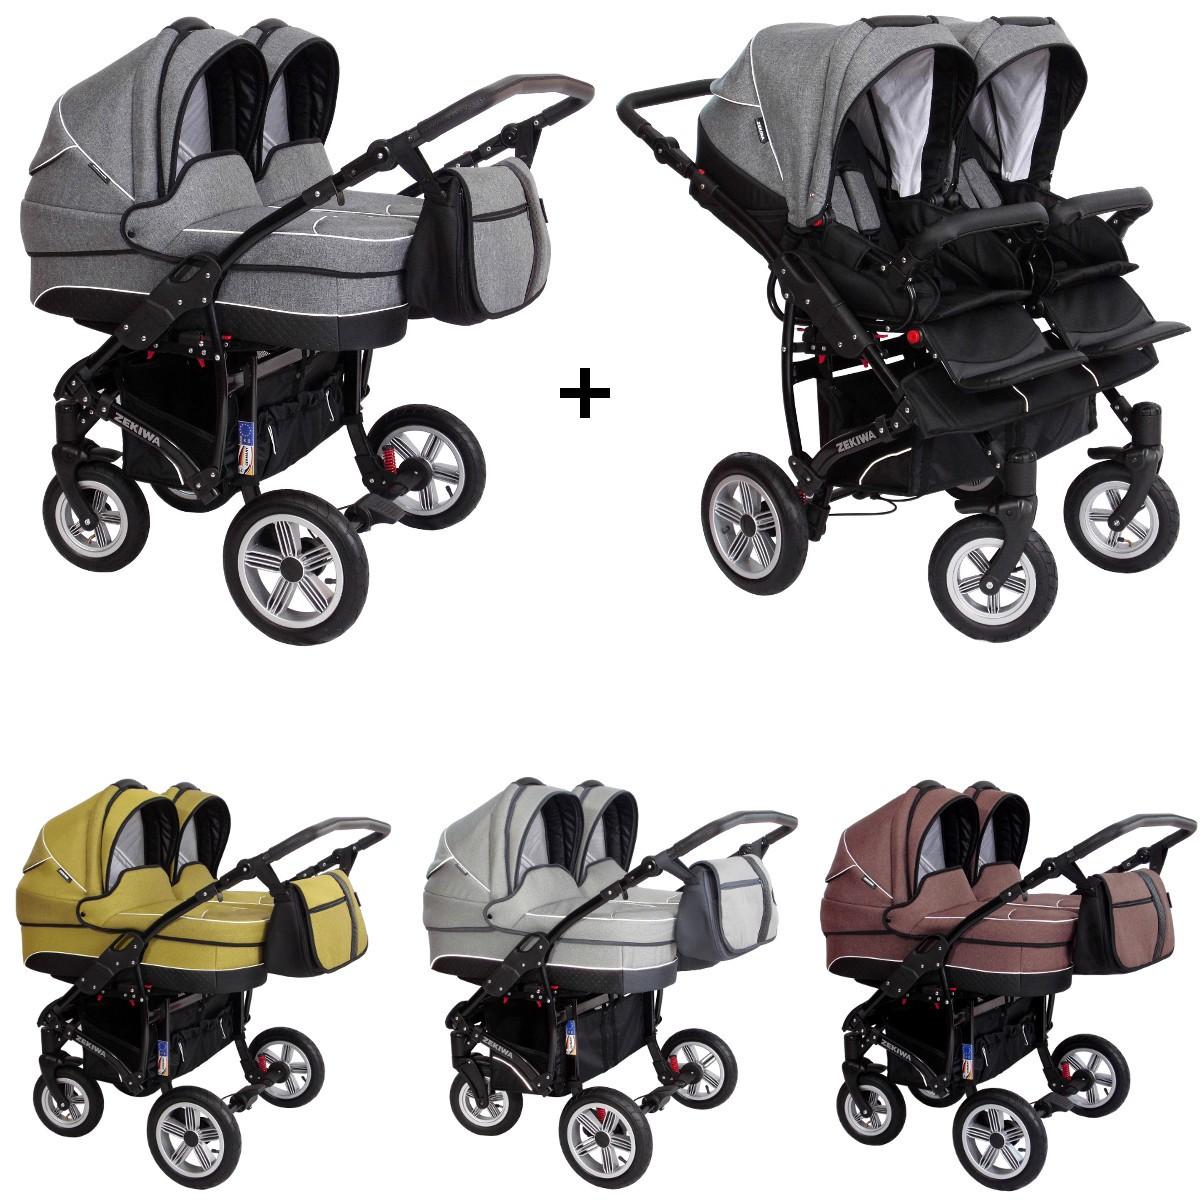 zekiwa sport duo new line zwillings geschwister kombi kinderwagen set 2in1 mit 2 babywannen 2. Black Bedroom Furniture Sets. Home Design Ideas